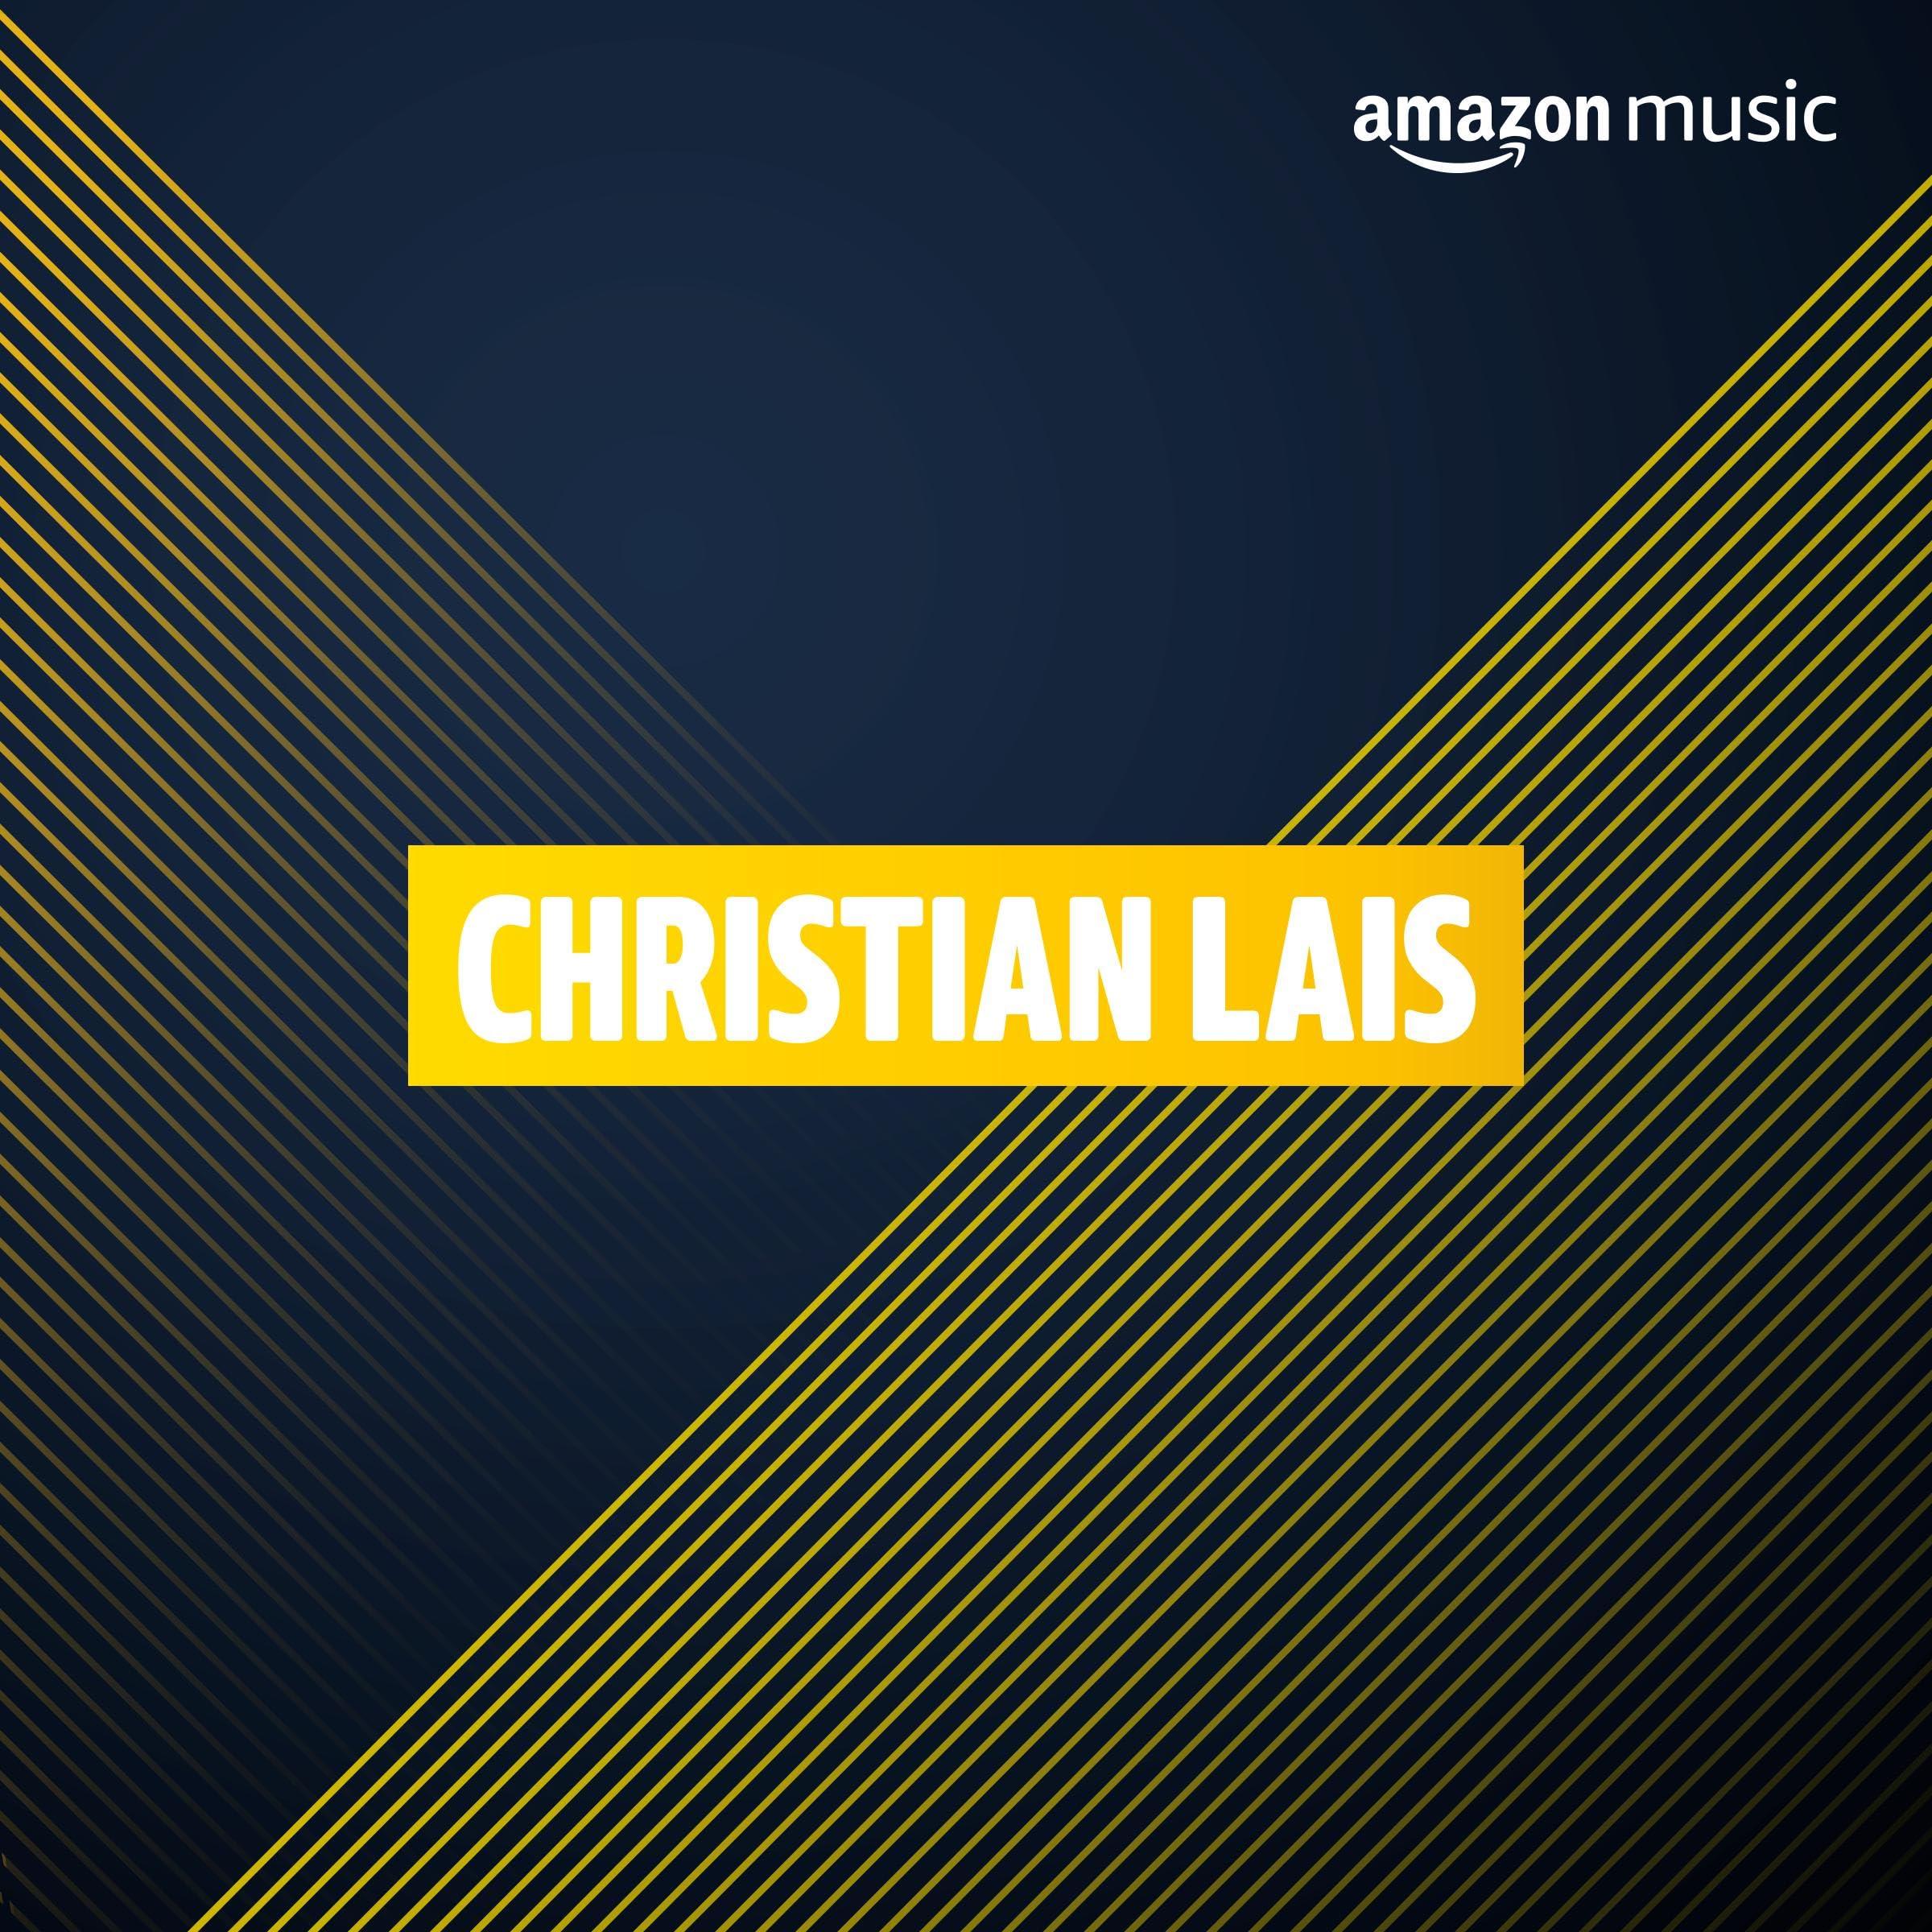 Christian Lais